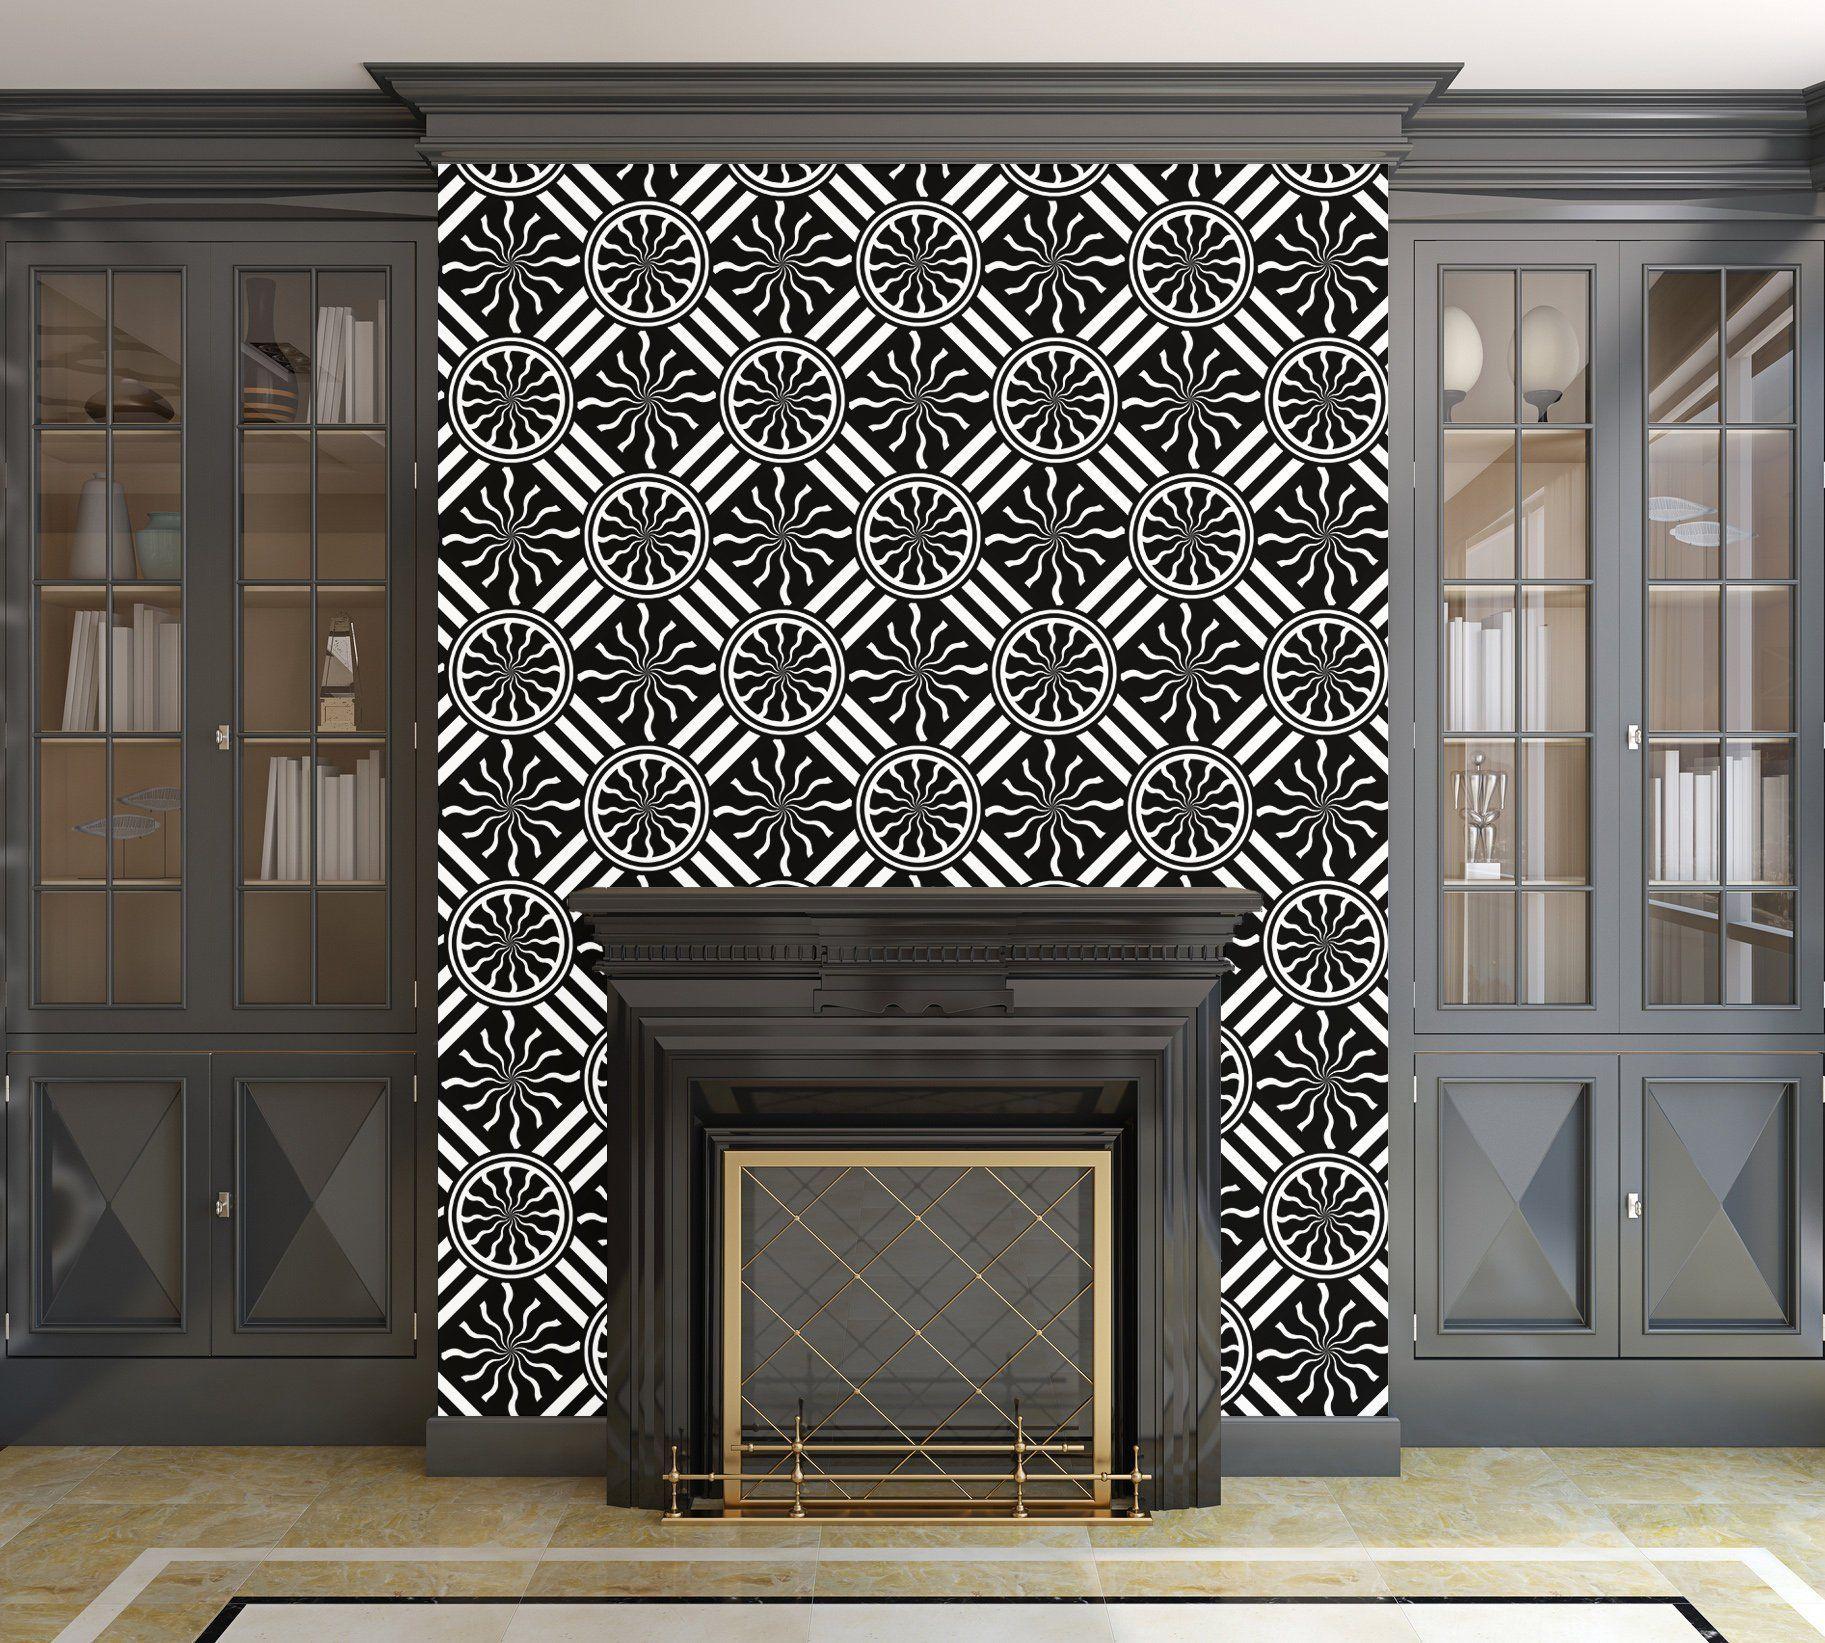 Wavy Black and White Pinwheel and Stripes Illustration